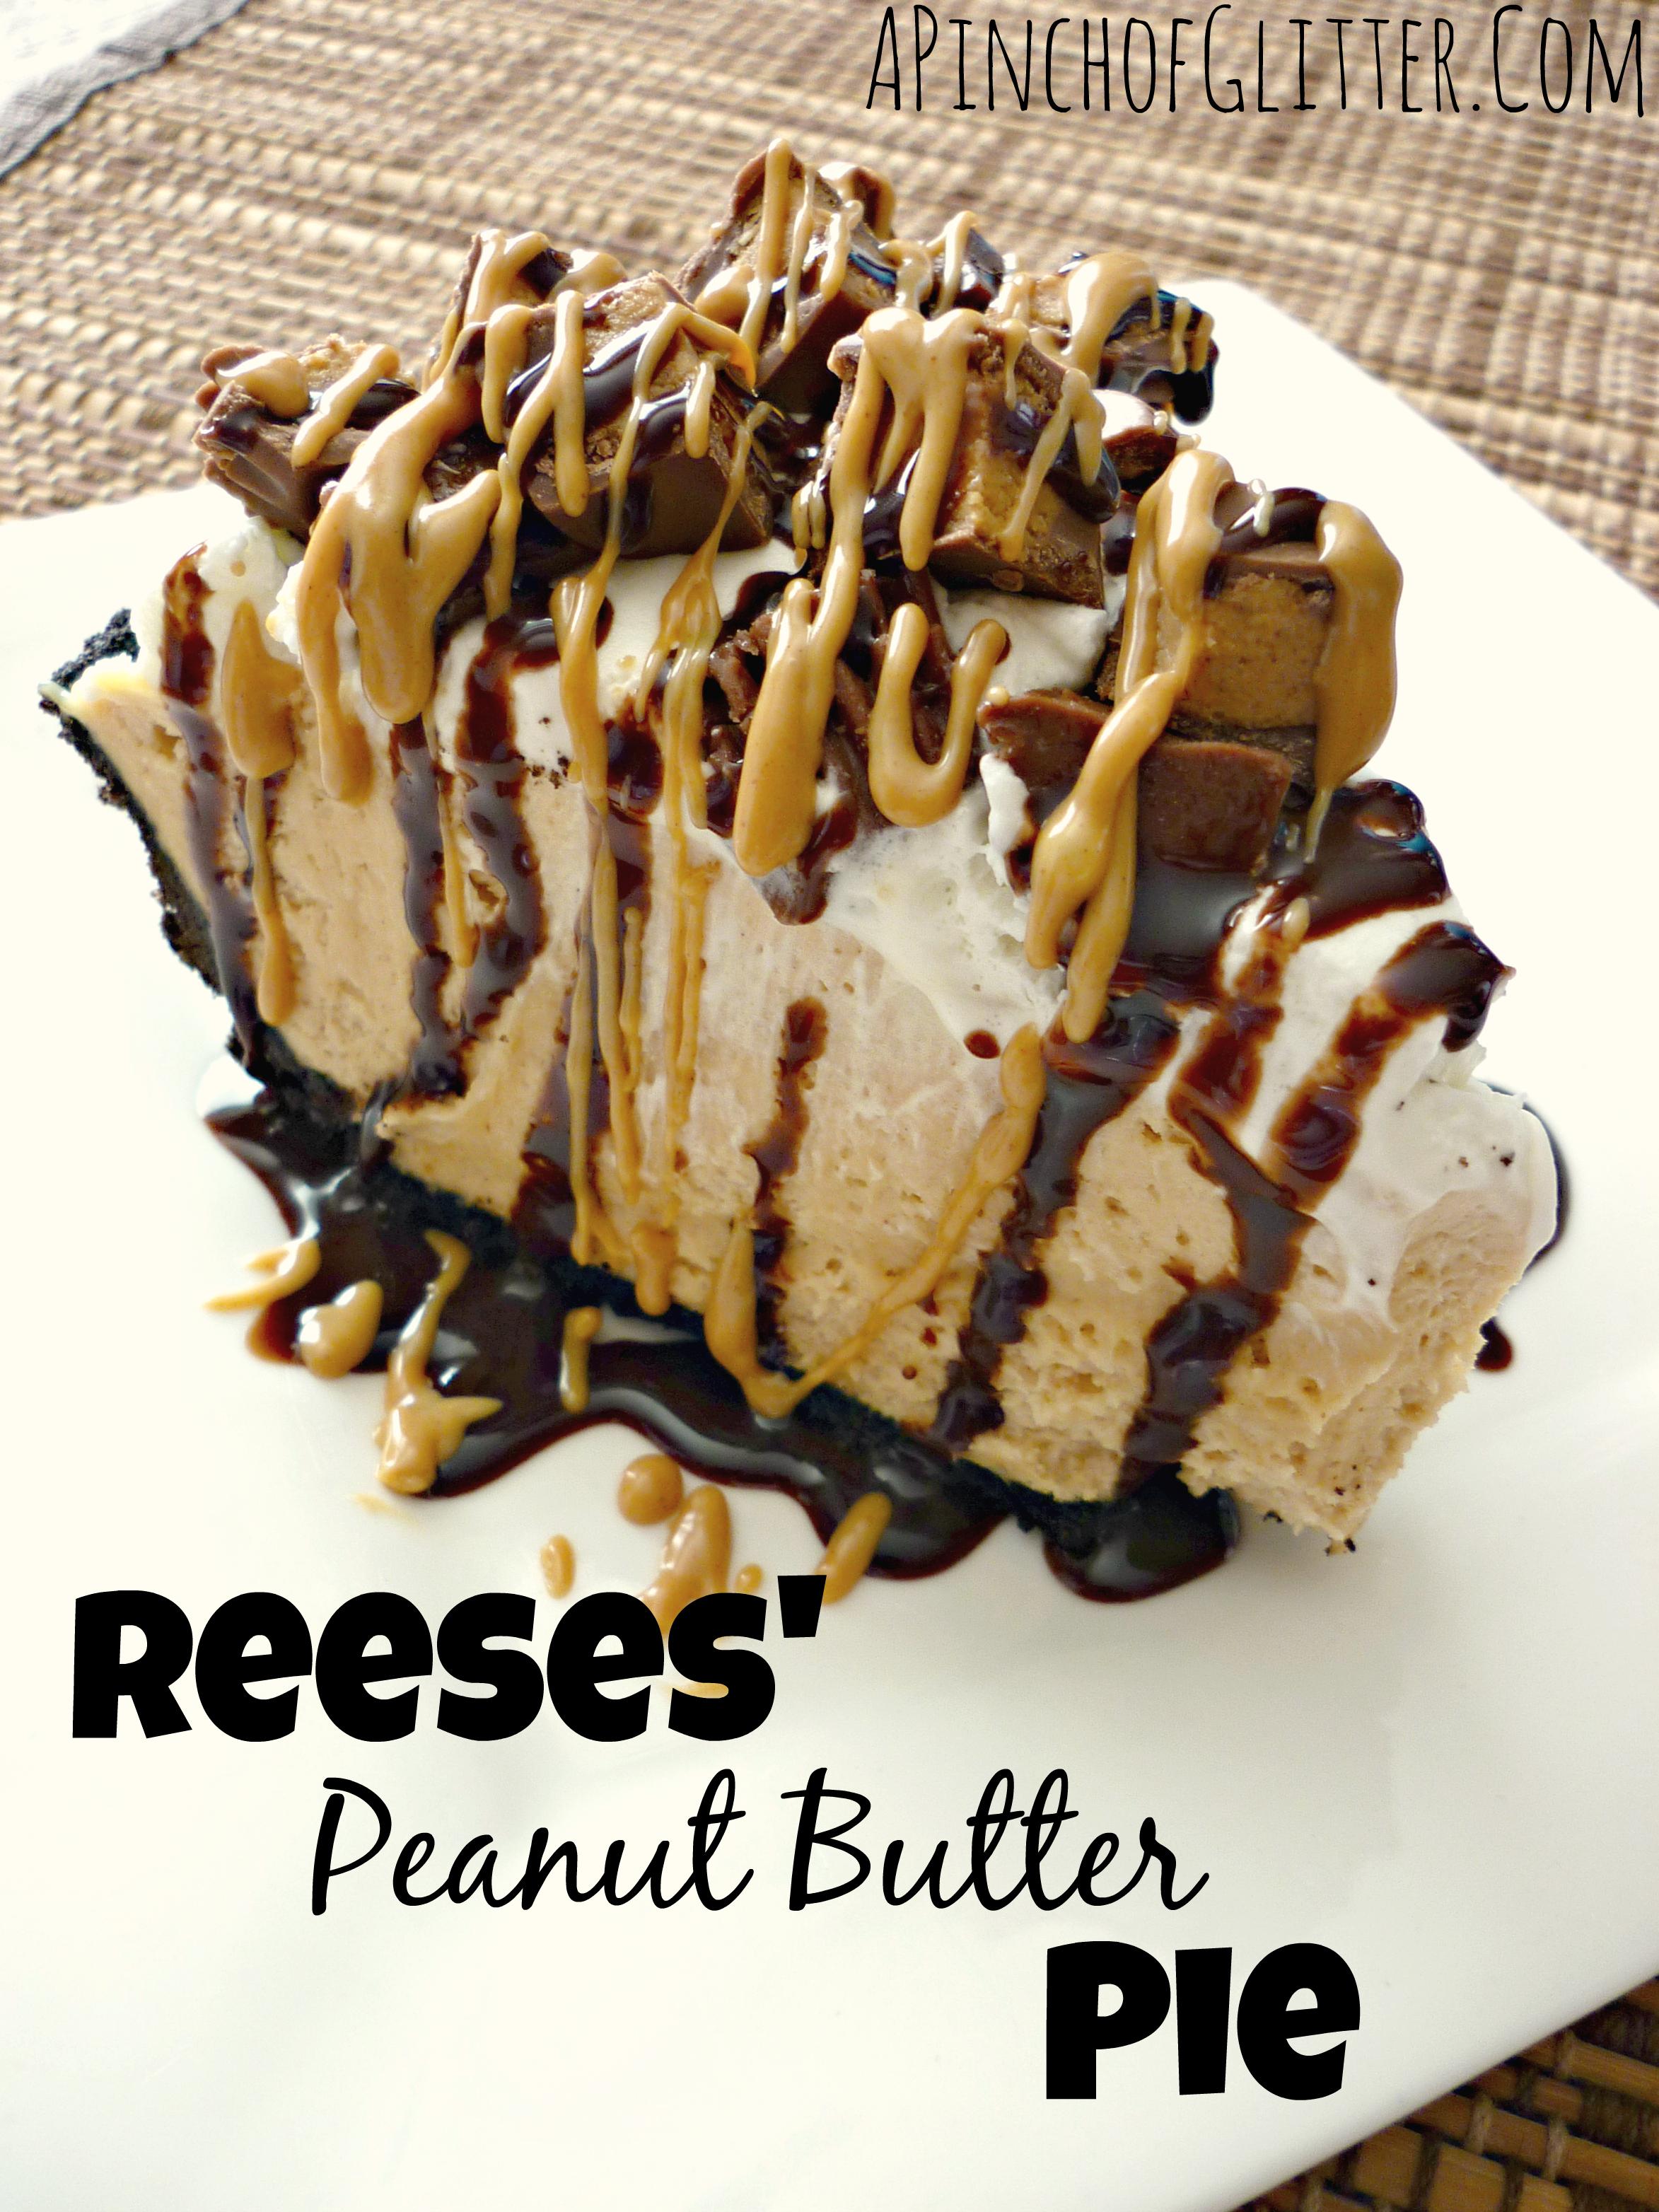 Reese's Peanut Butter Pie | mandysrecipeboxblog.com